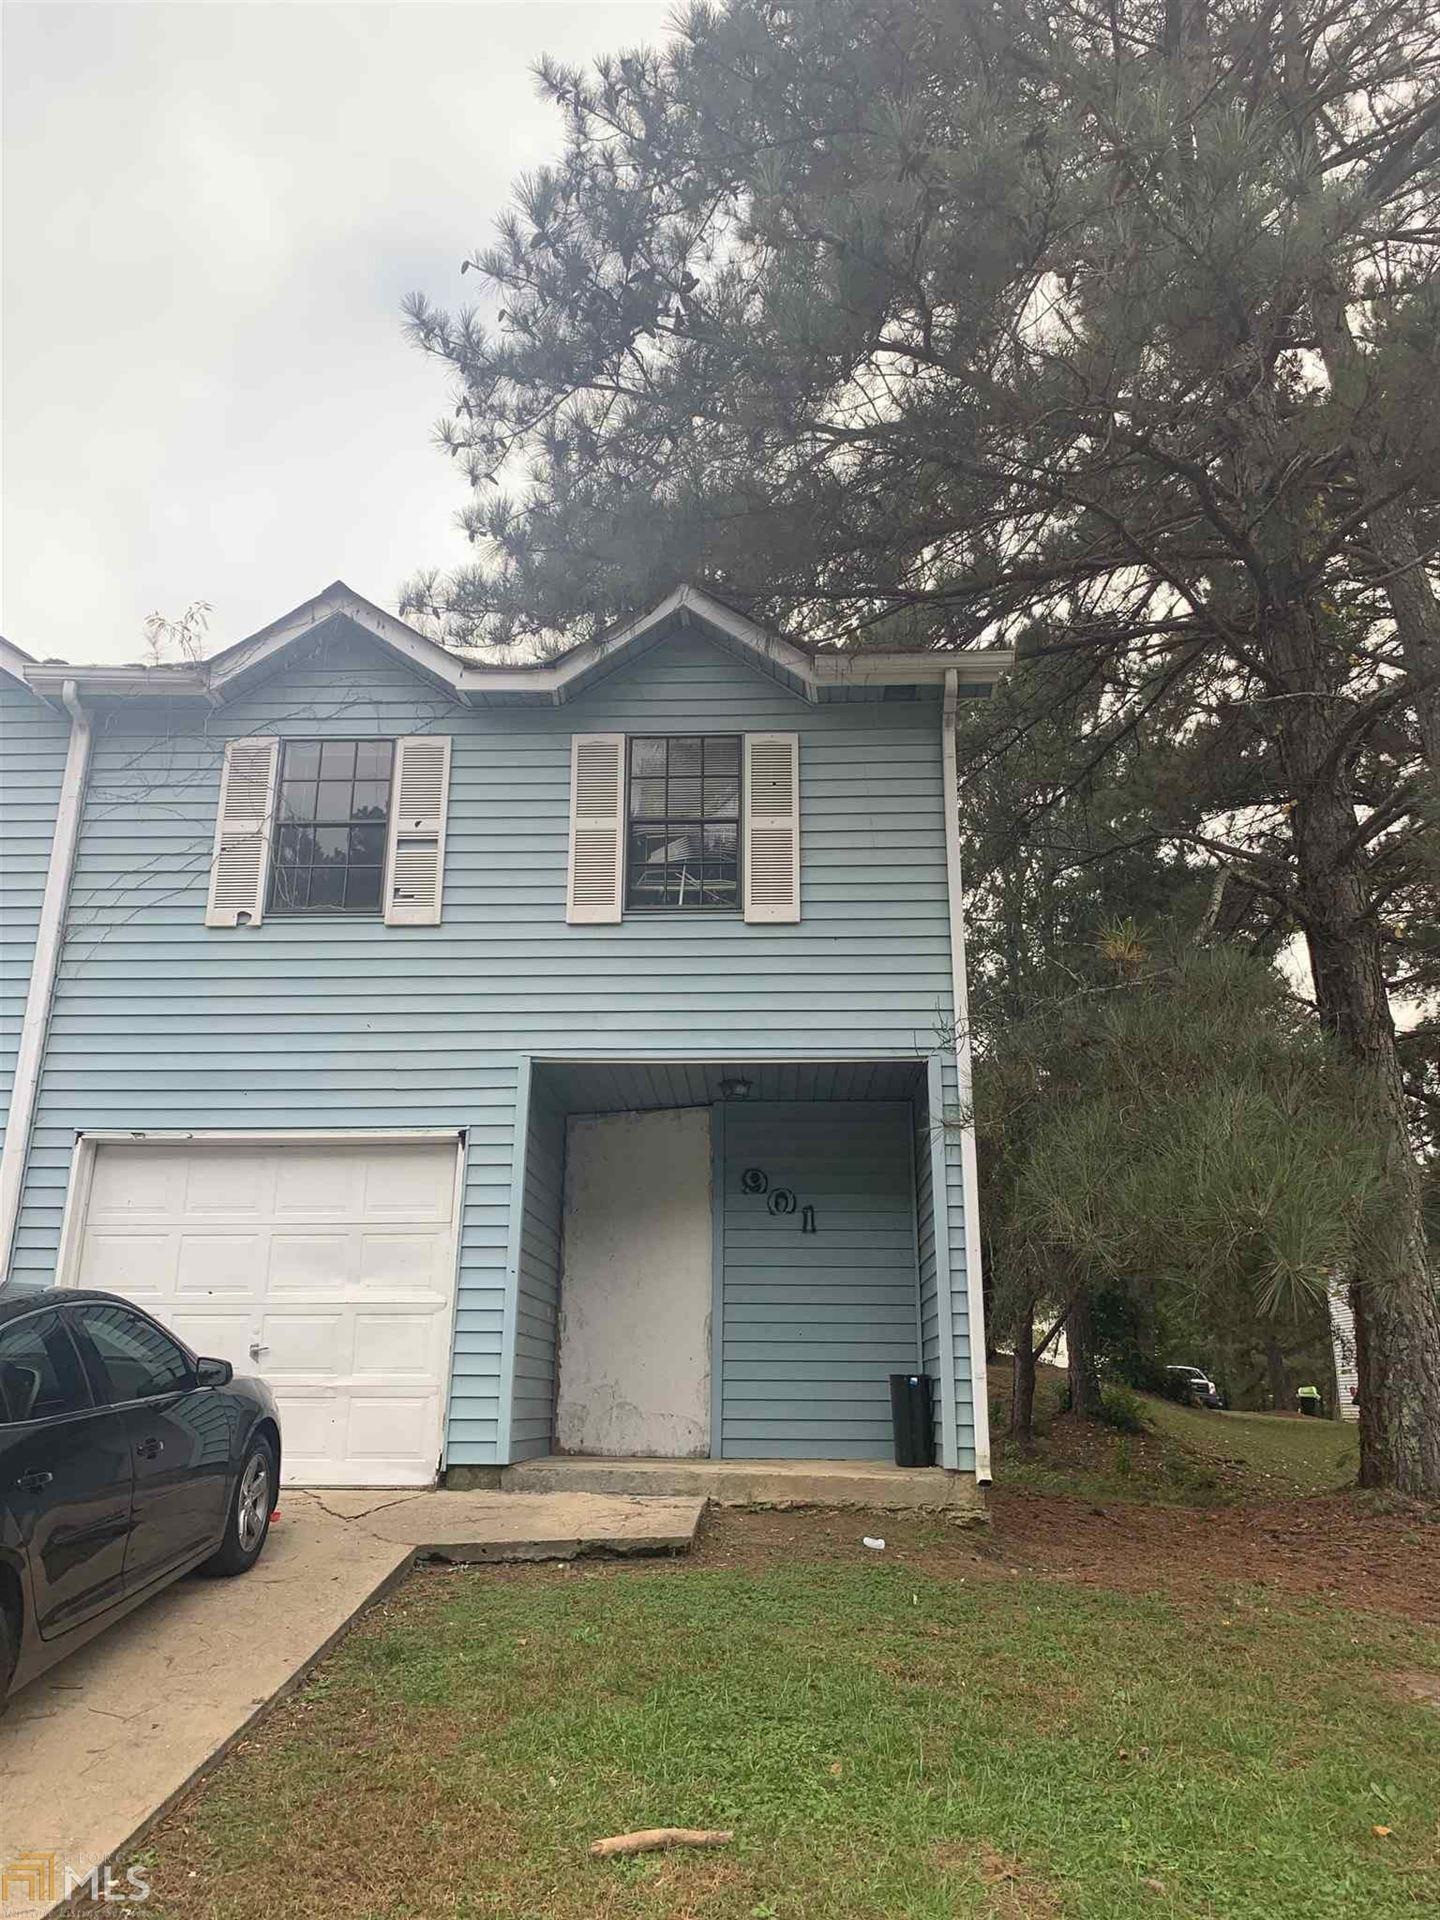 901 Pine Tree Trl, Atlanta, GA 30349 - MLS#: 8900190